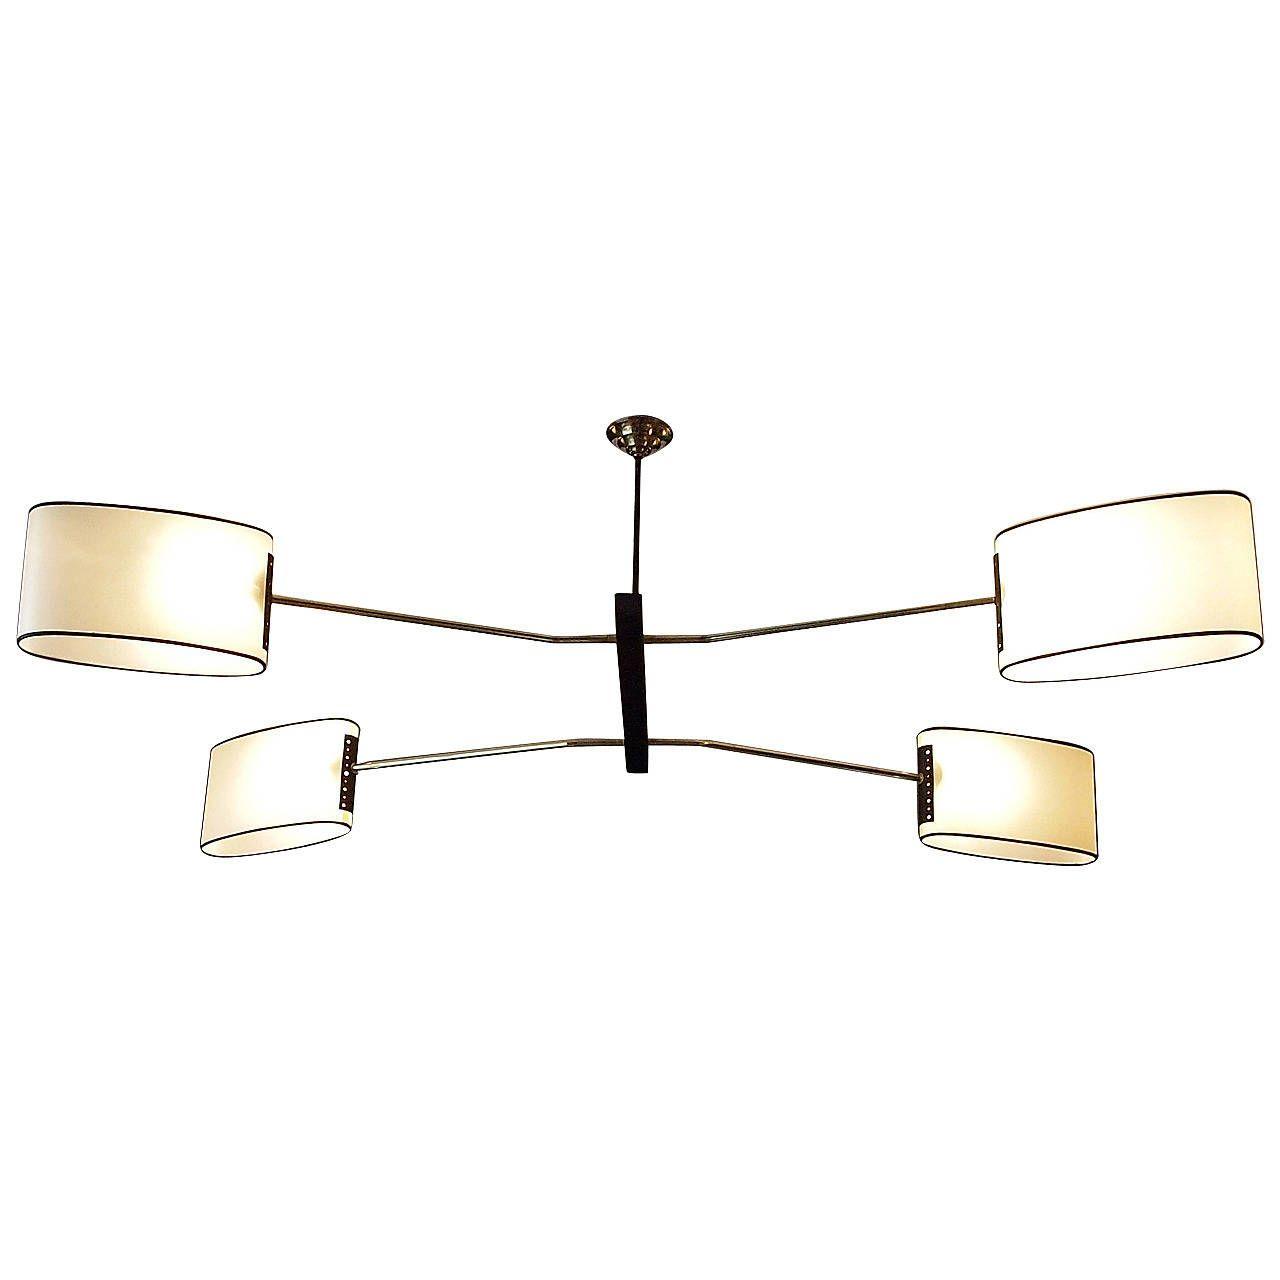 Ss chandelier by maison arlus pendant lighting